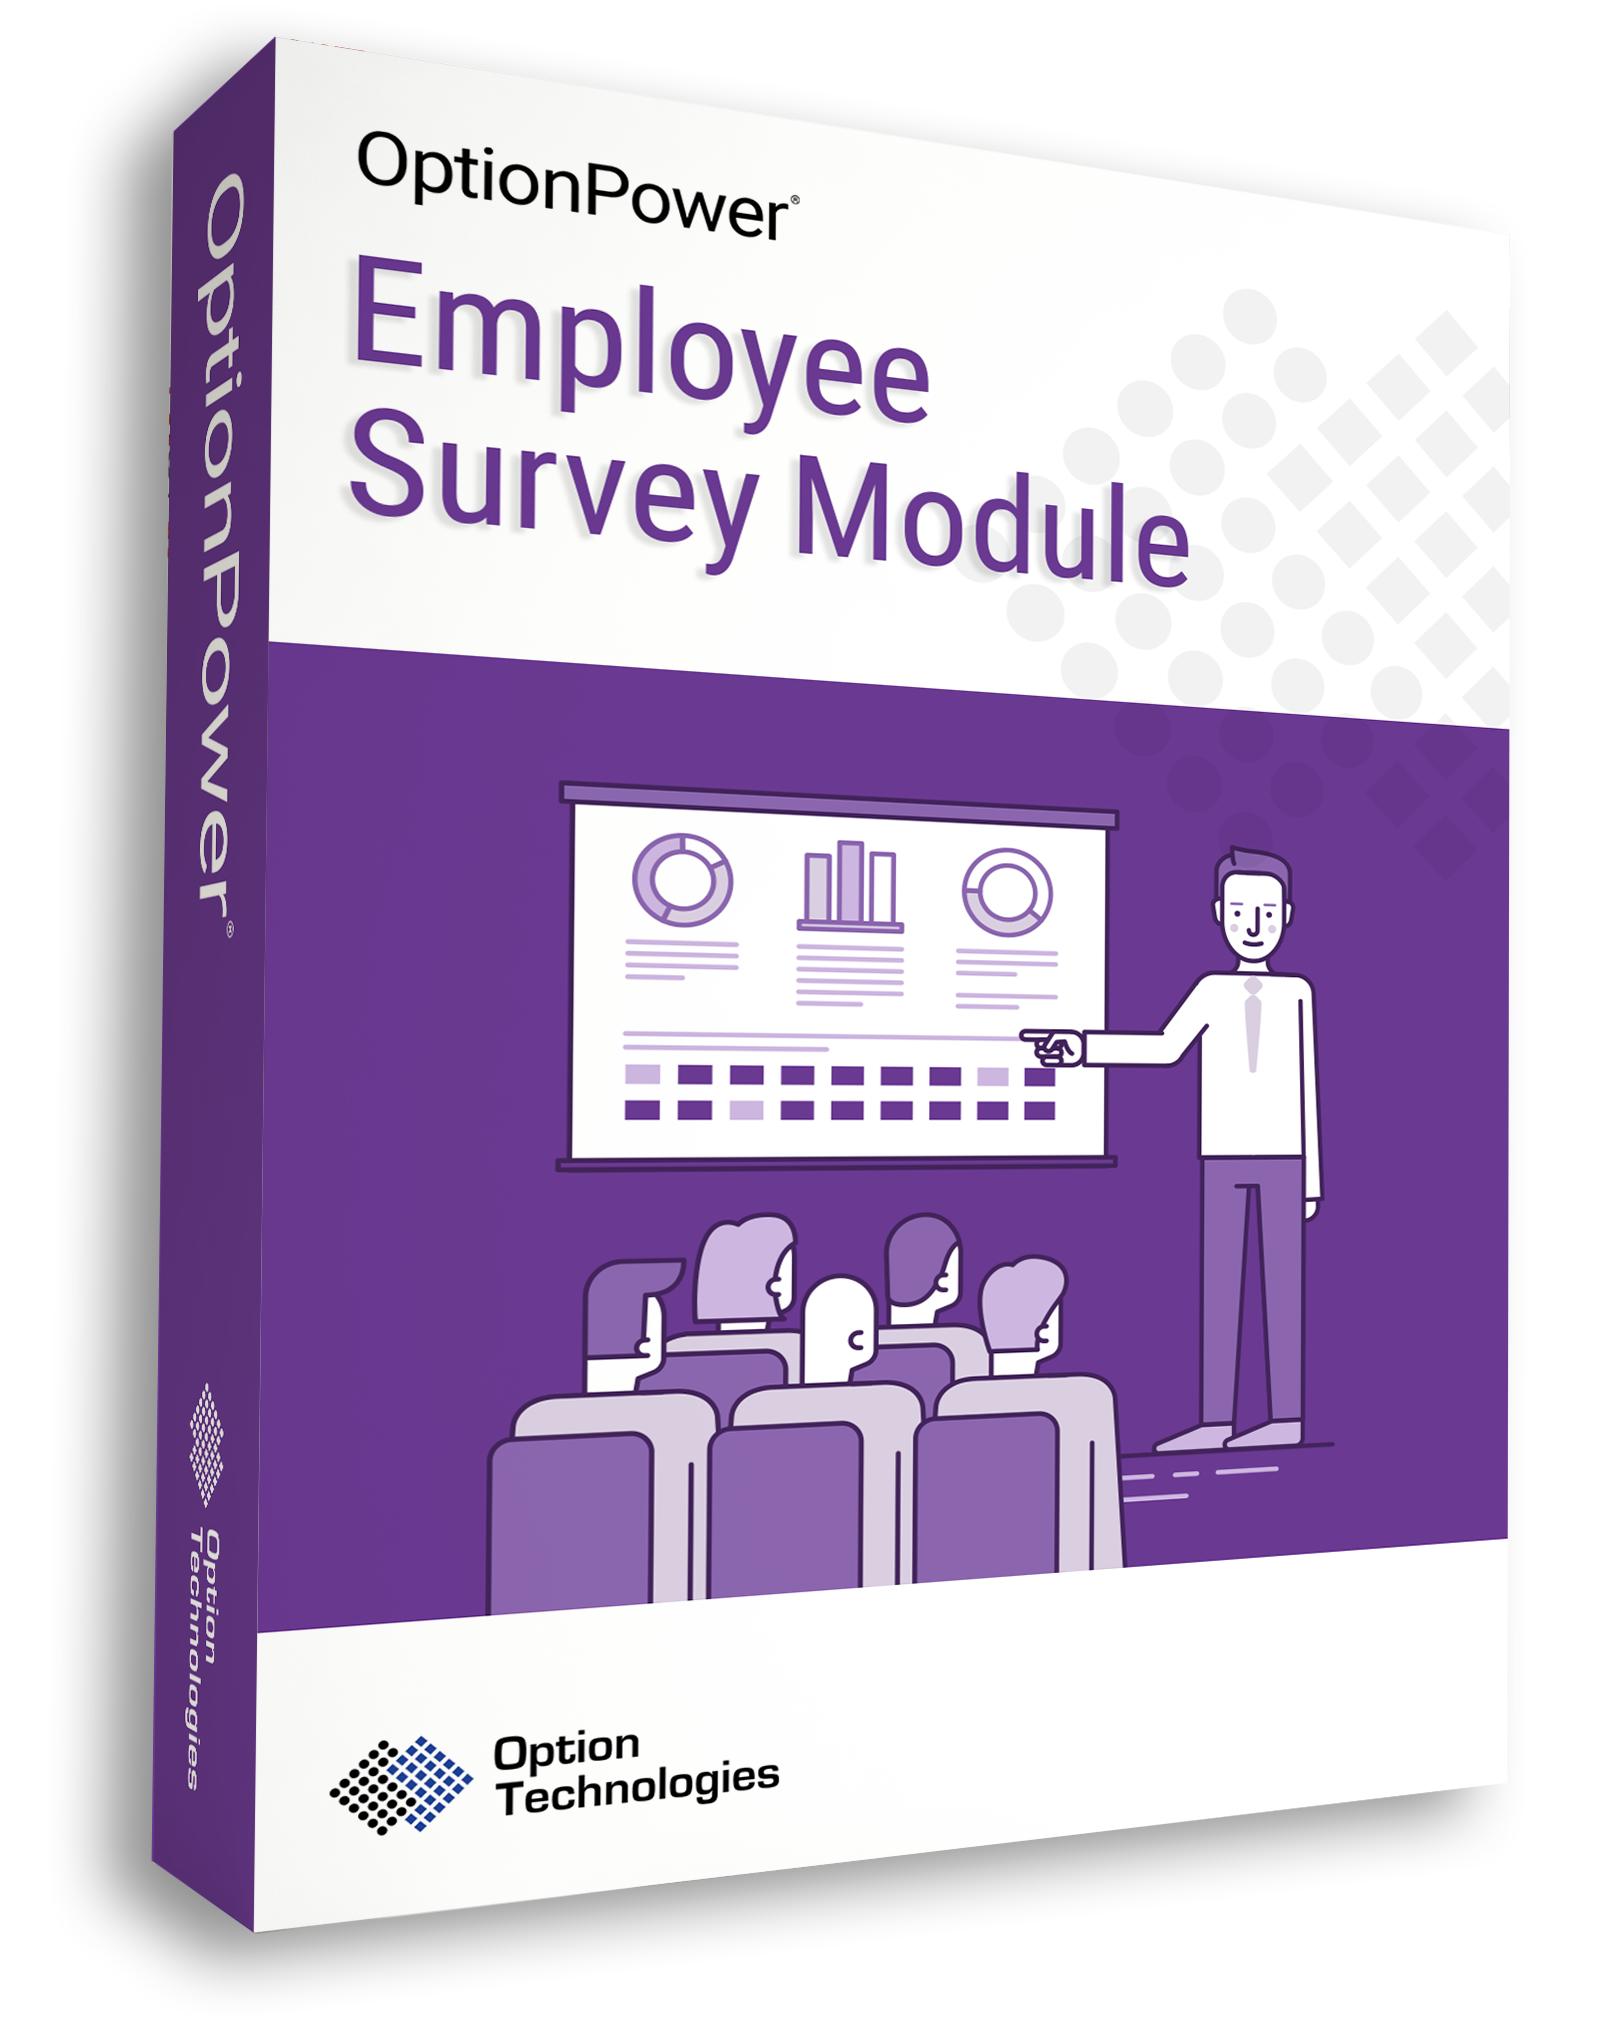 OptionPower-BoxArt-Employee-Survey